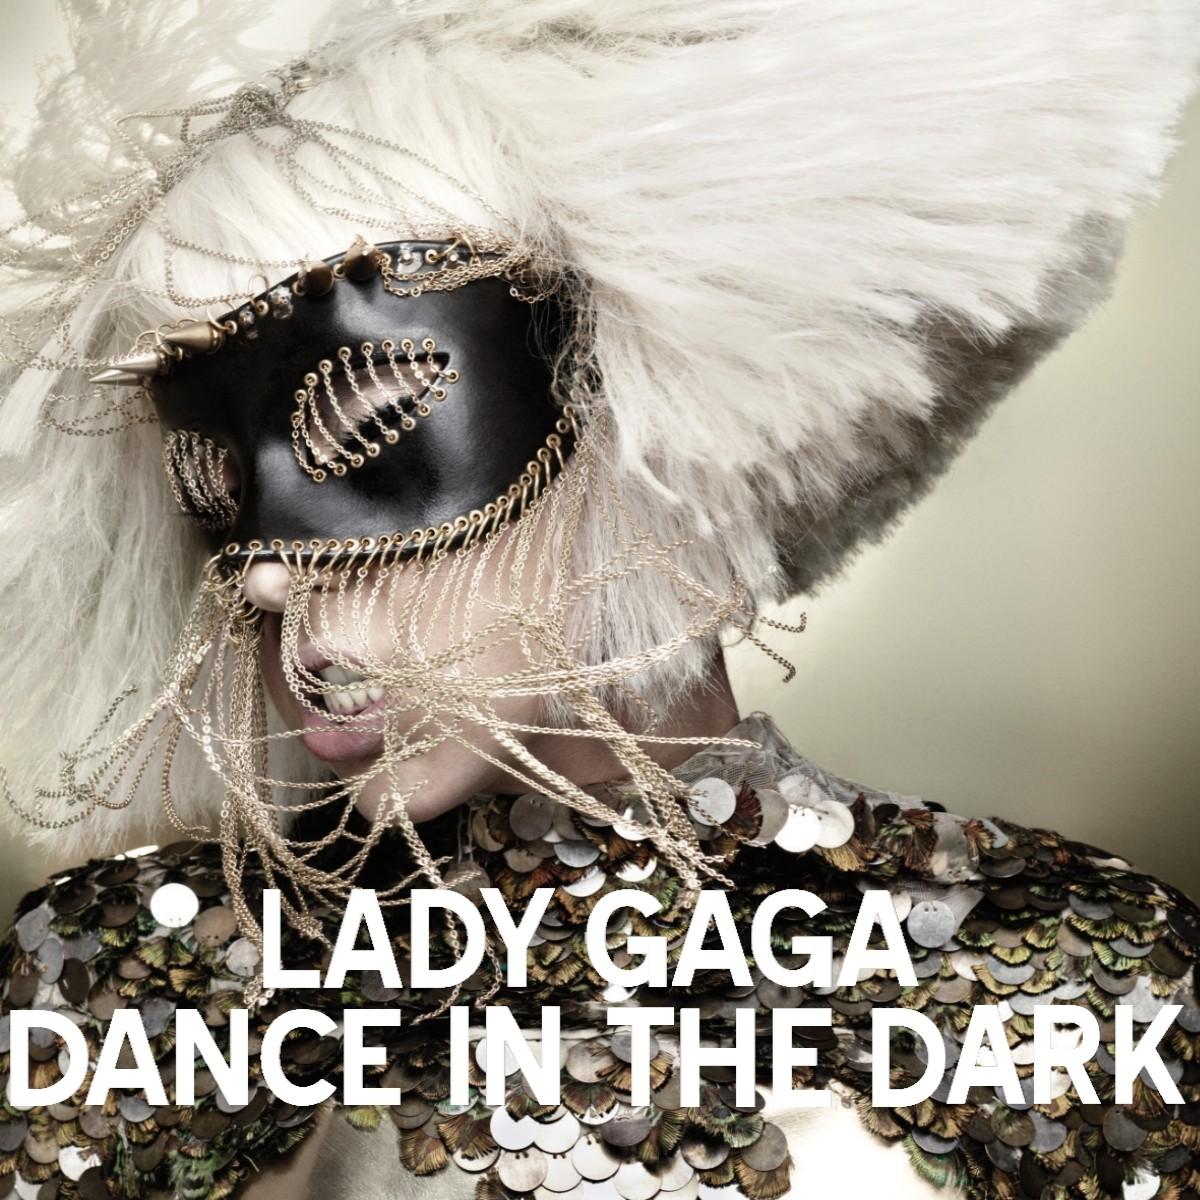 Dance in the Dark (song)